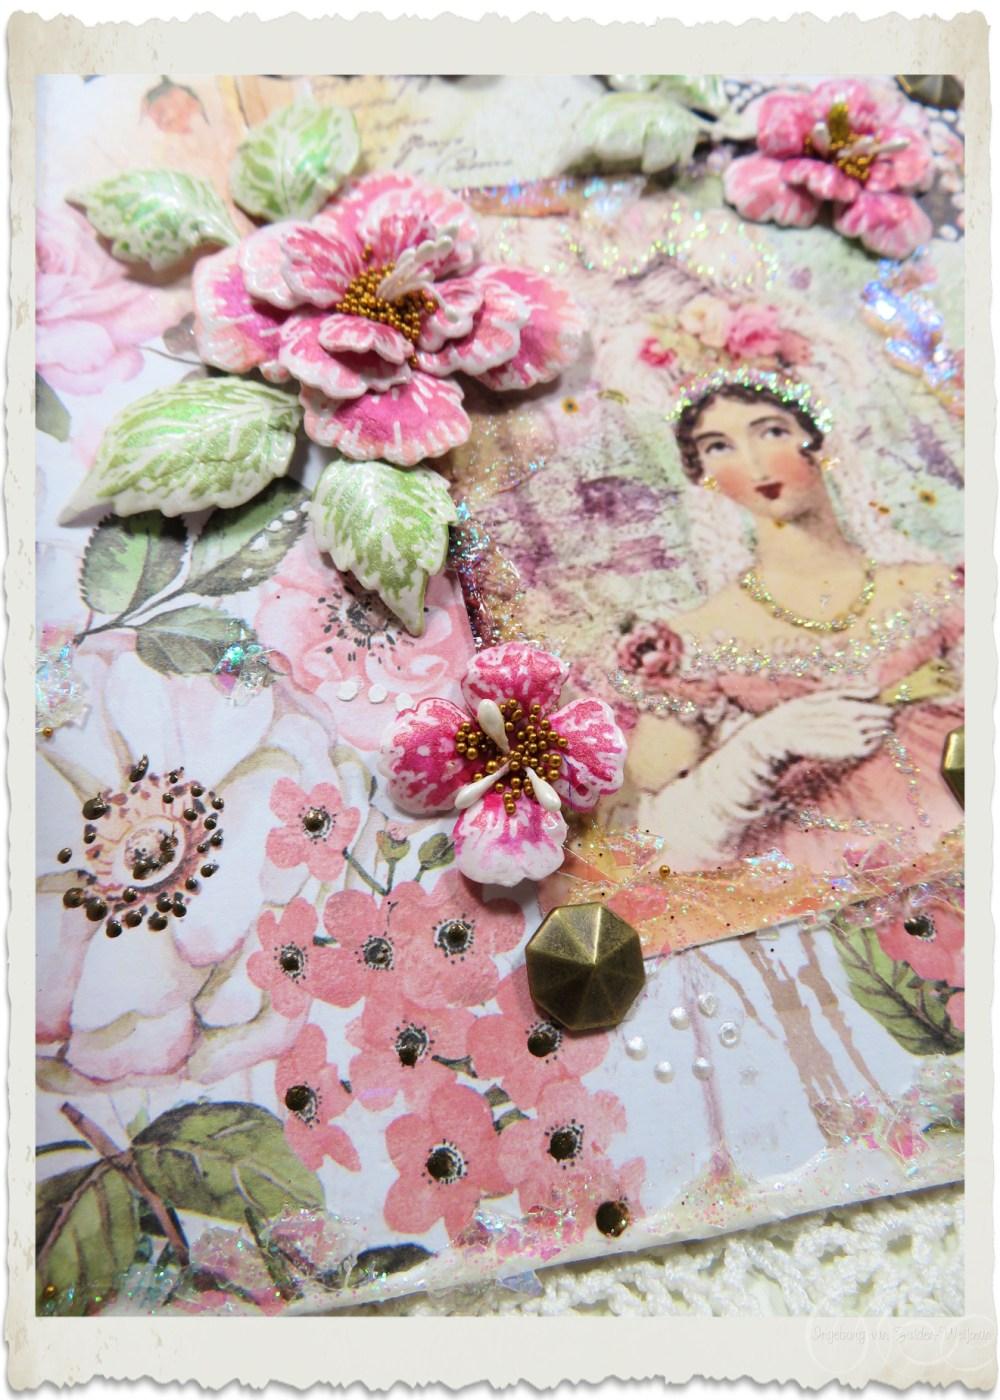 Details of handmade paper flowers by Ingeborg van Zuiden